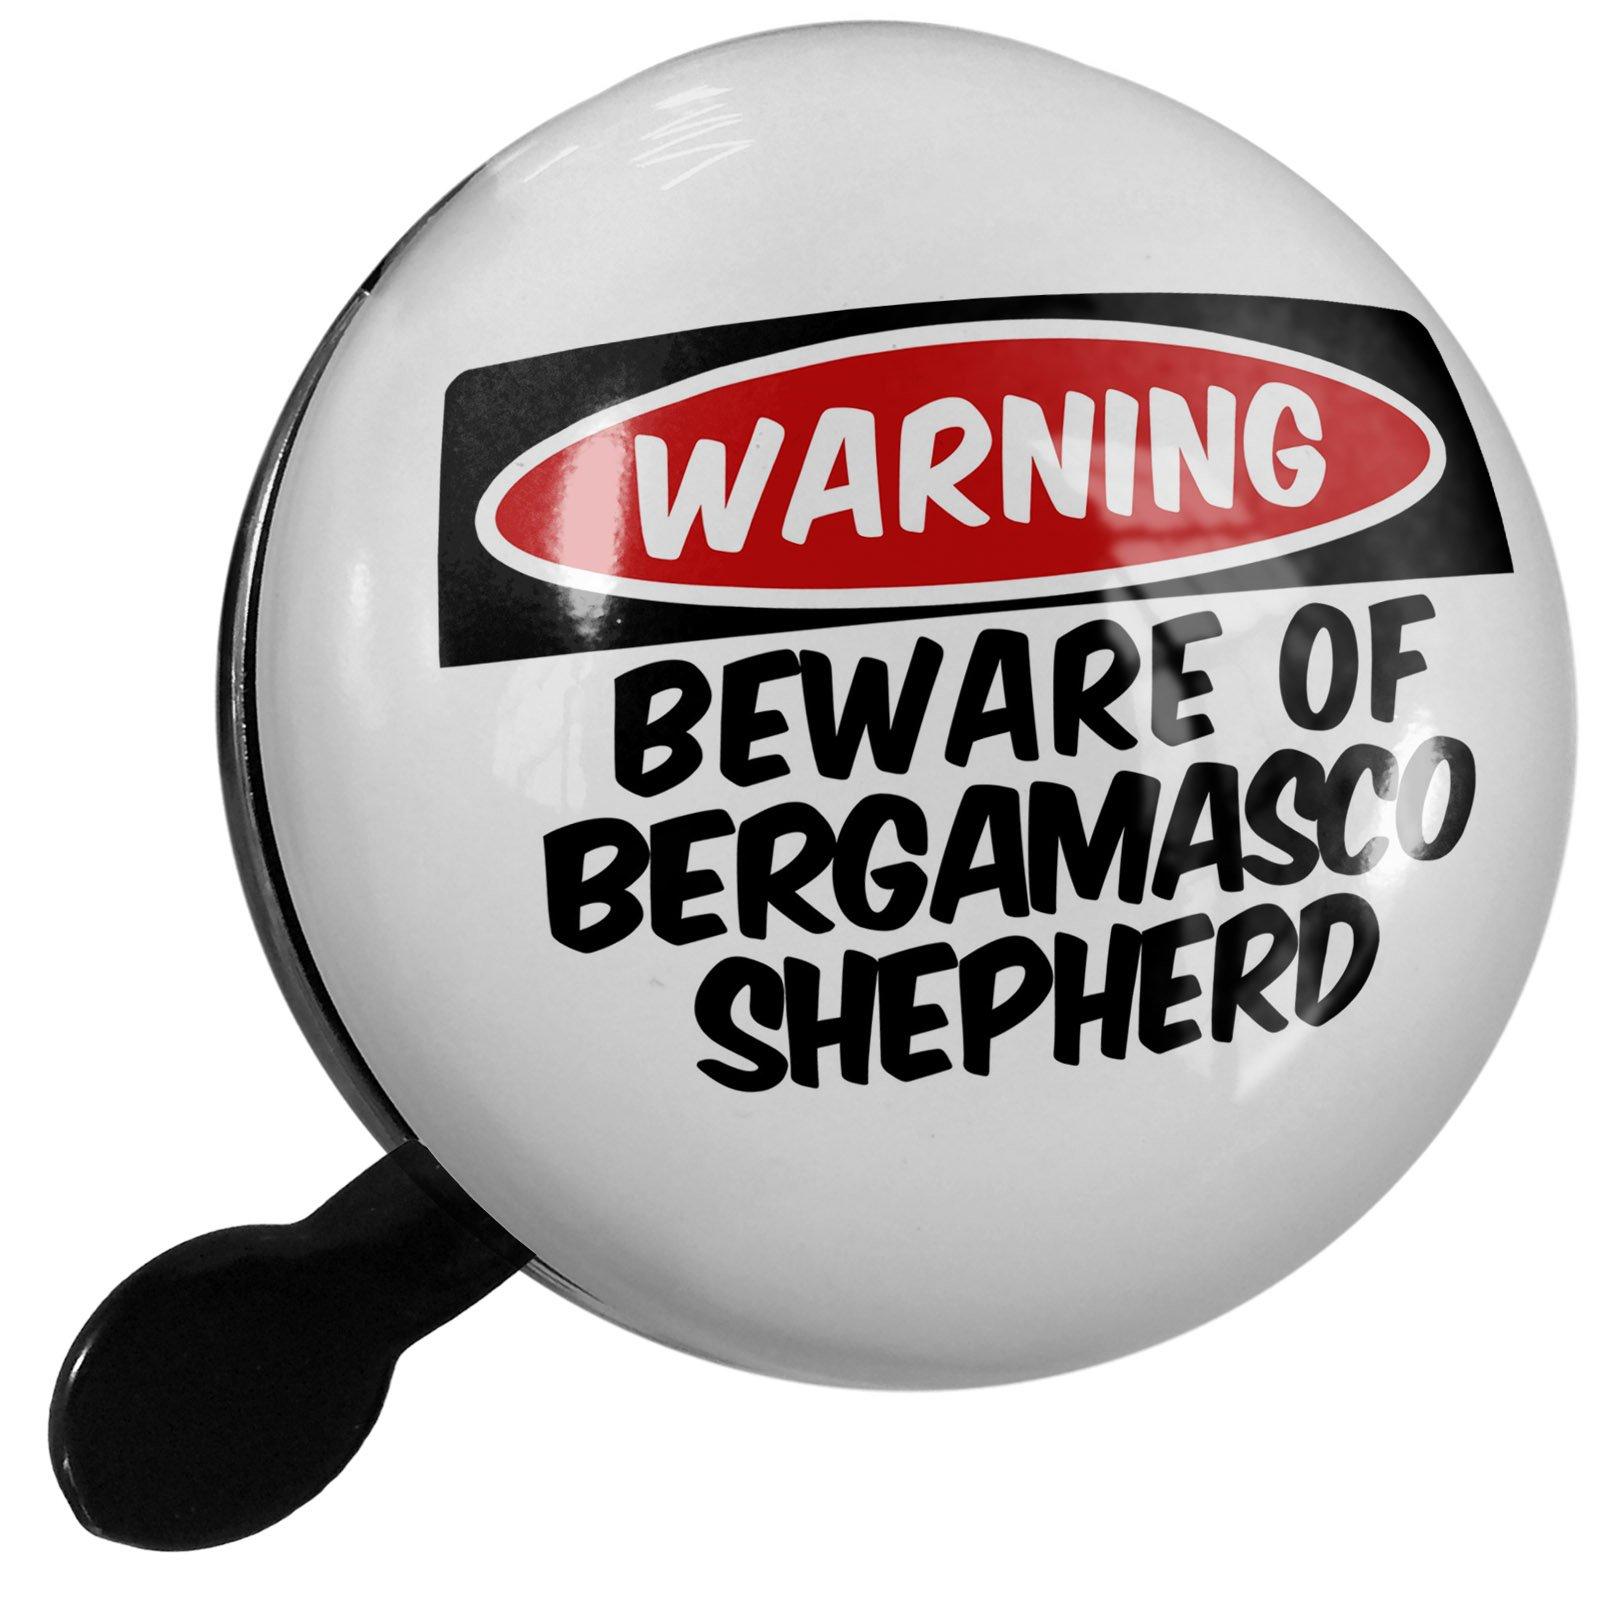 Small Bike Bell Beware of the Bergamasco Shepherd Dog from Italy - NEONBLOND